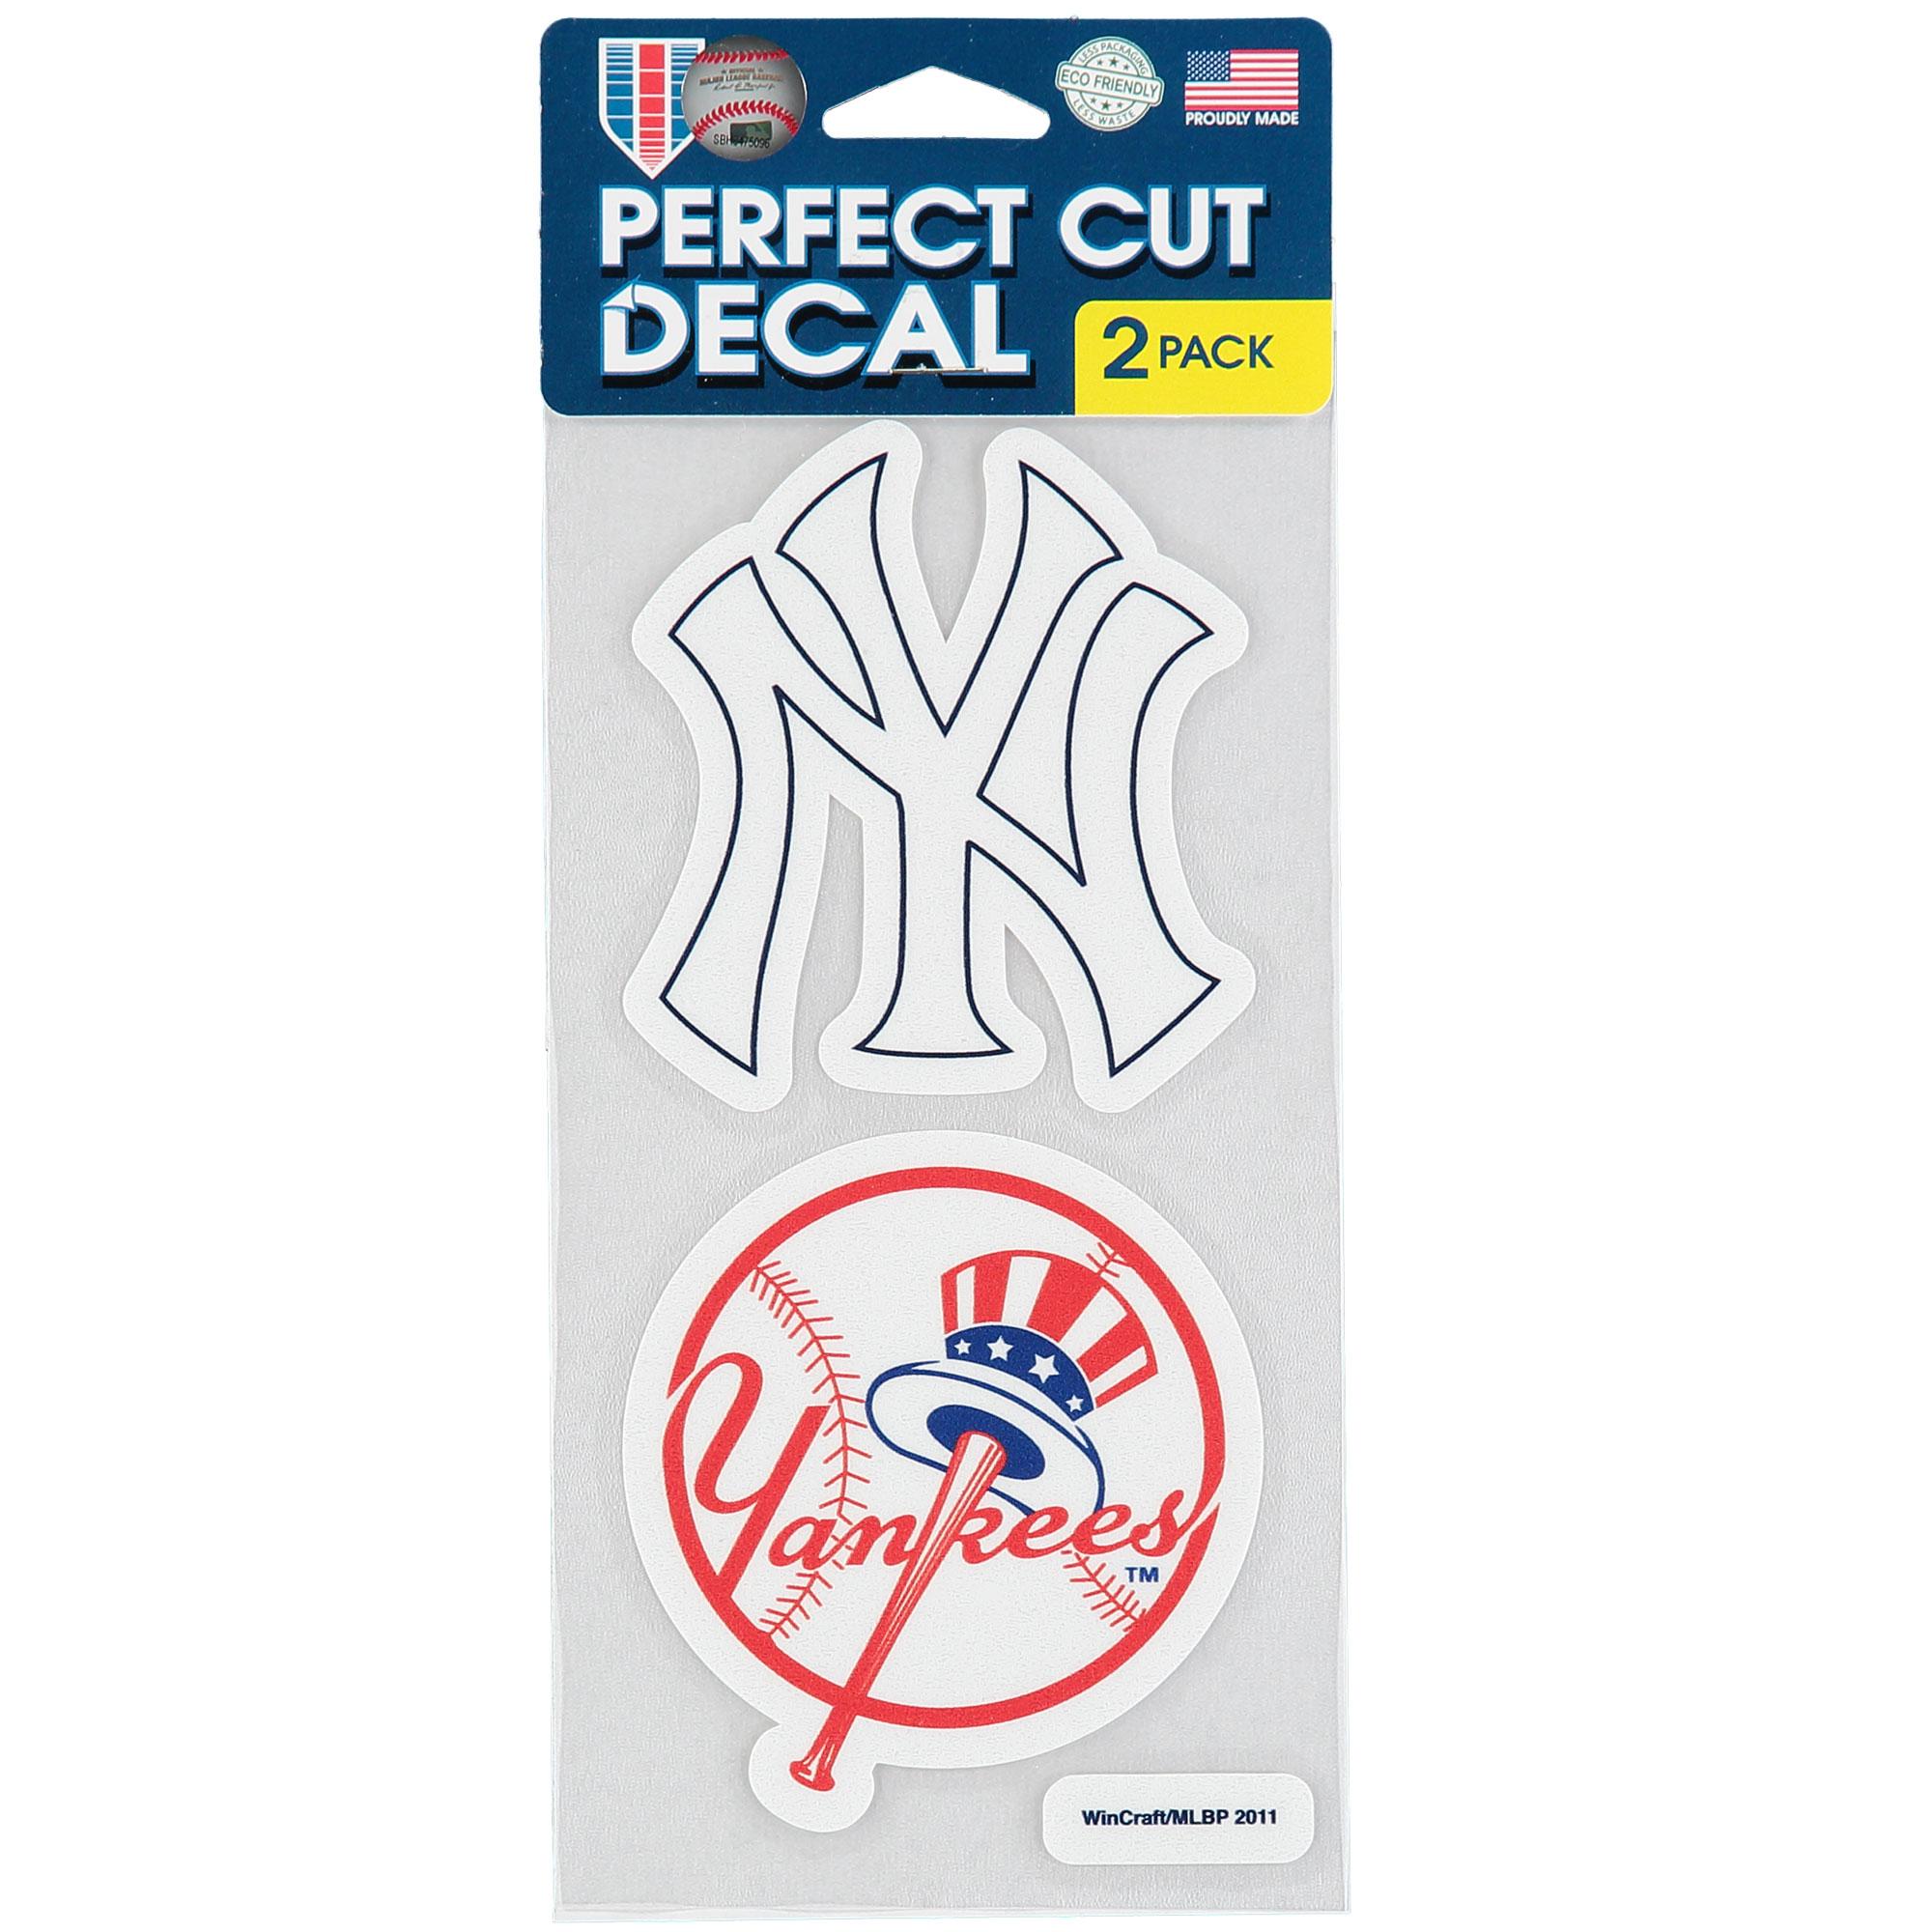 New York Yankees 2-Pack 4'' x 4'' Die-Cut Decals - No Size